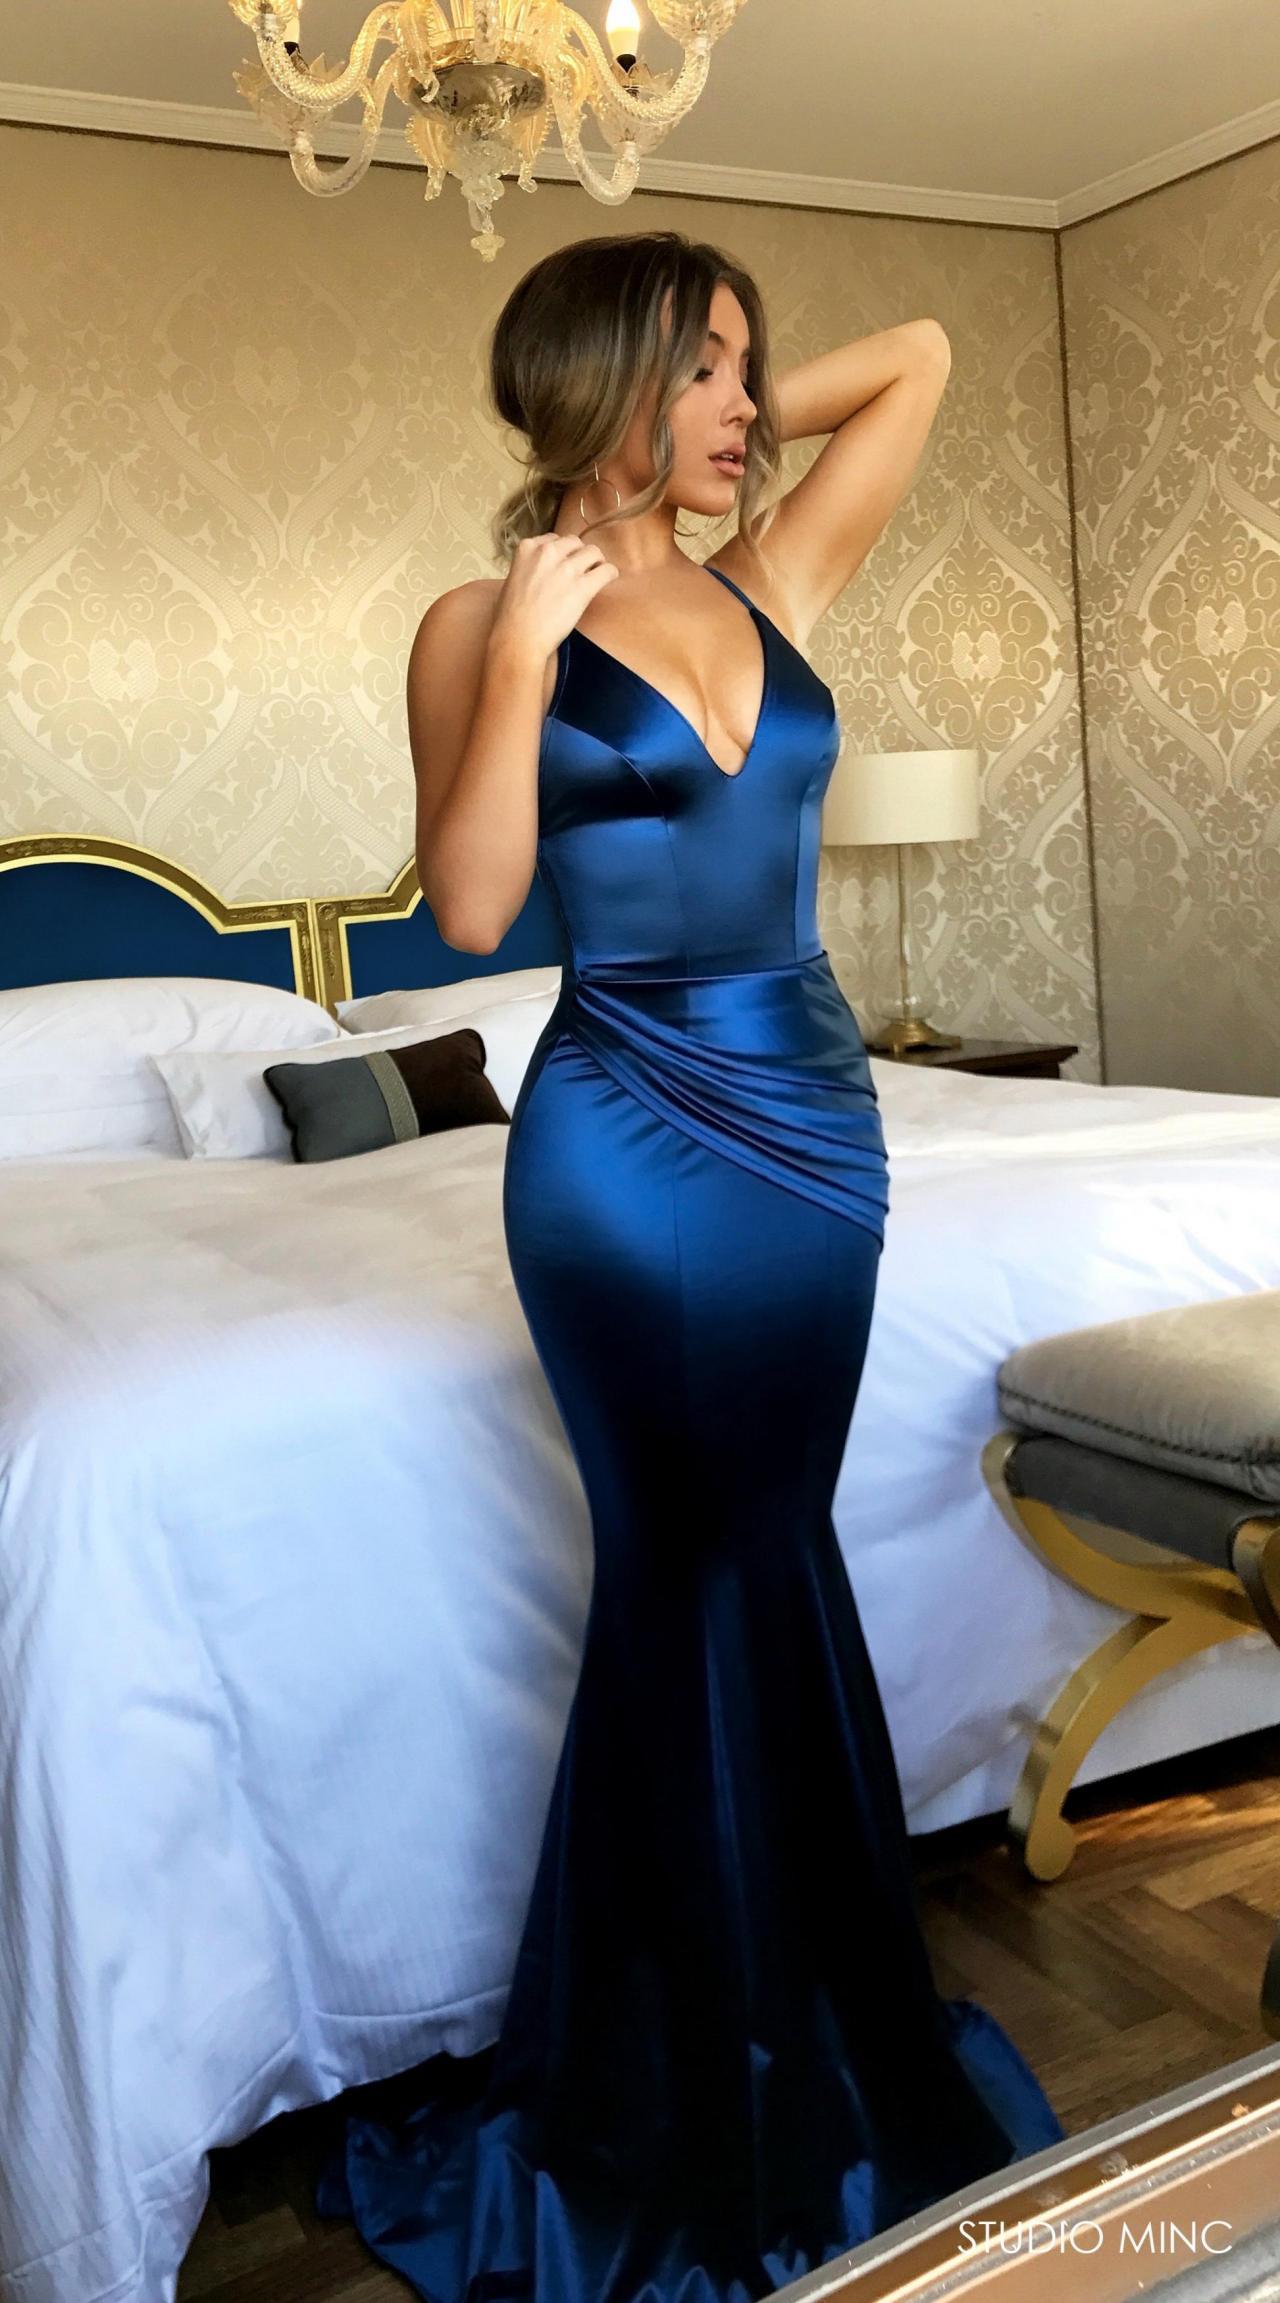 2018 New Mermaid Prom Dressesshirt Dress V Neck Prom Dressparty Dresseswomen Dressesroyal Blue Evening Dress